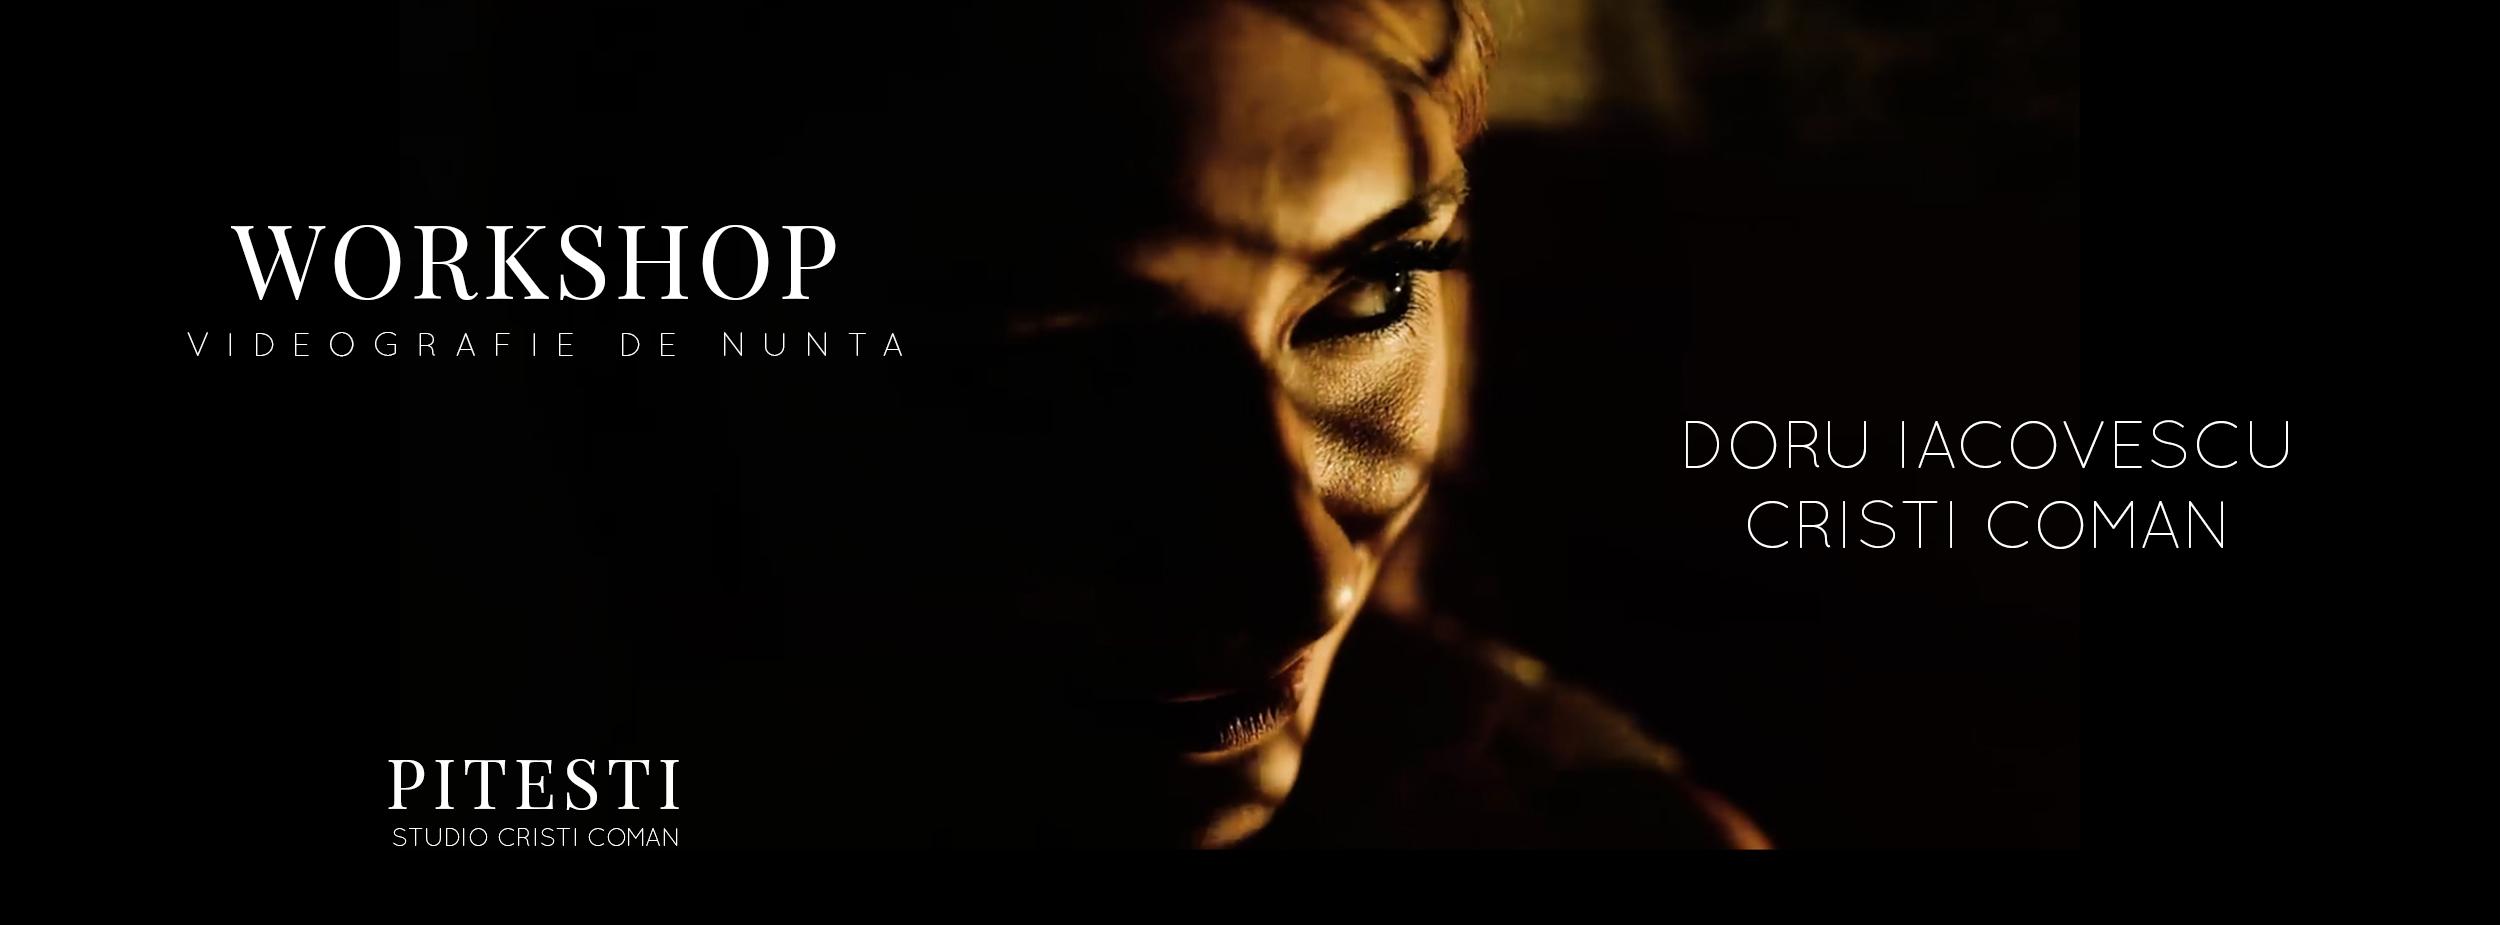 Workshop Videografie - Doru Iacovescu & Cristi Coman